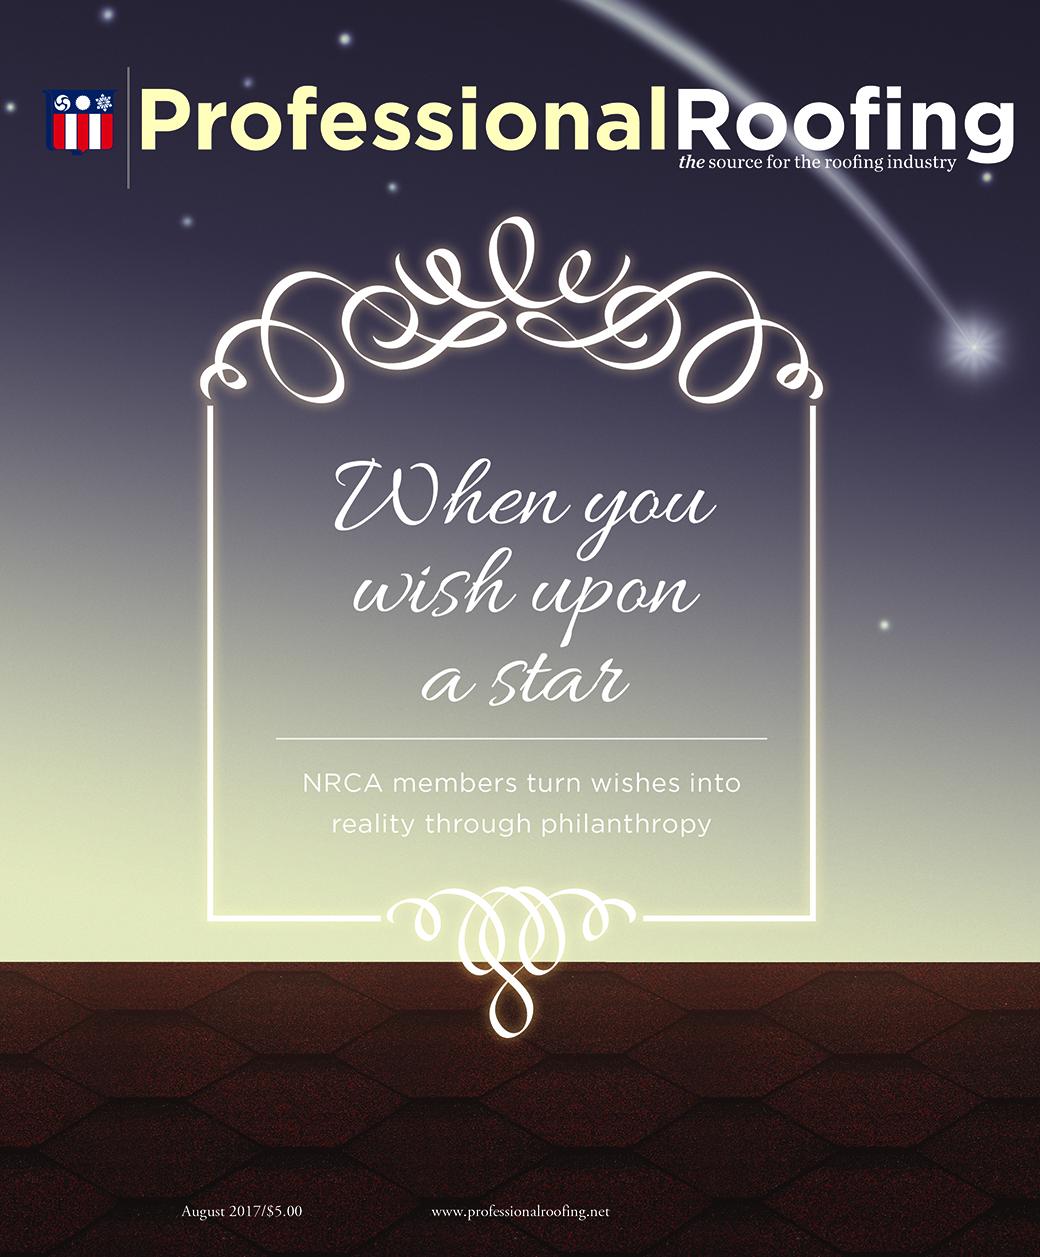 Professional Roofing Magazine 8/1/2017